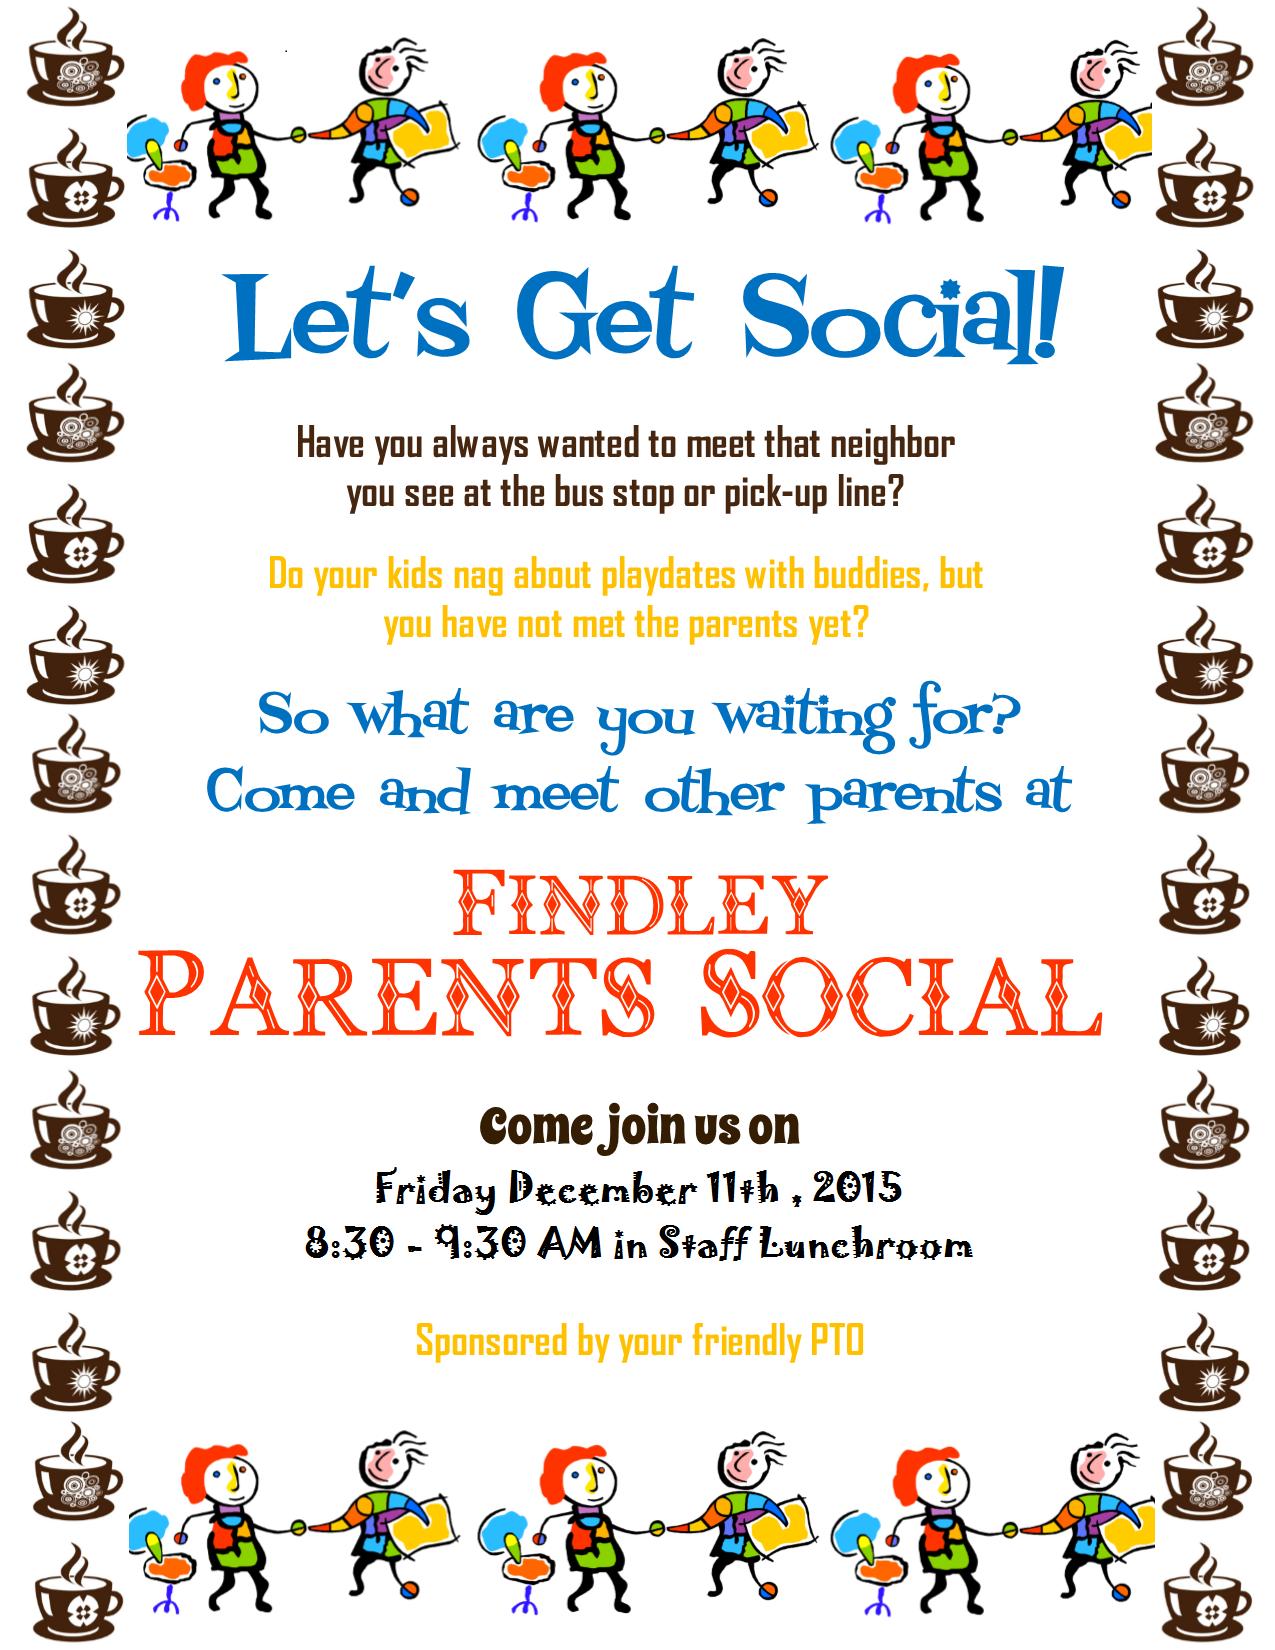 Parents Social